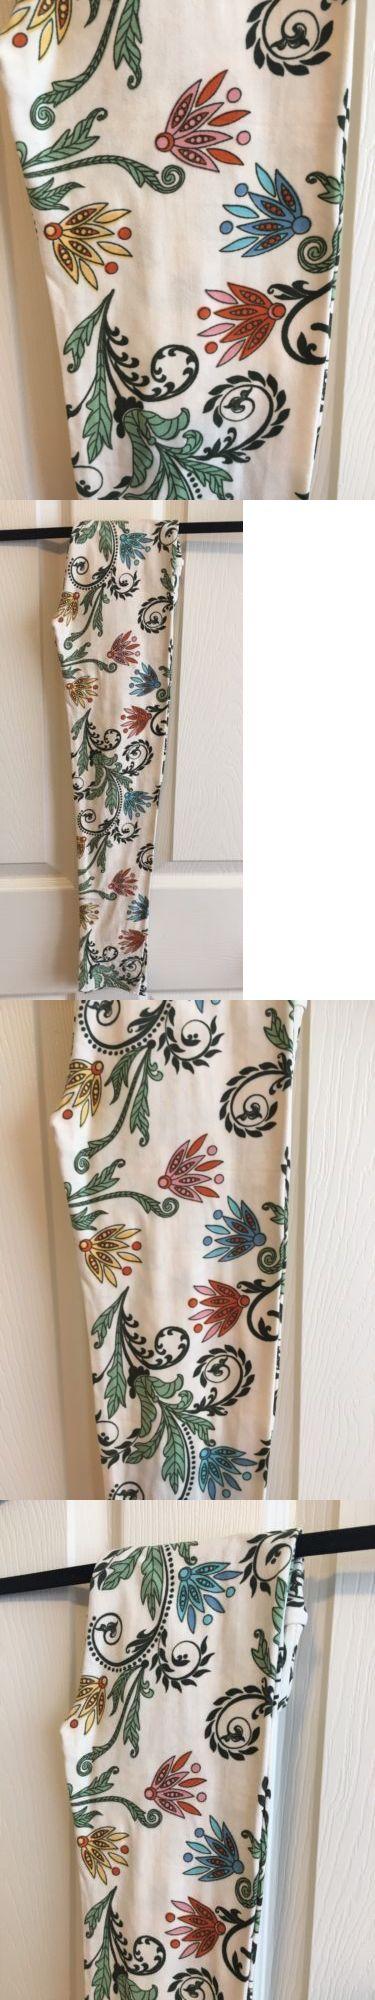 Leggings 152719: *New!* Lularoe Paisley Scroll Floral Vines Cream Leggings - Kids L Xl - Unicorn! -> BUY IT NOW ONLY: $34 on eBay!